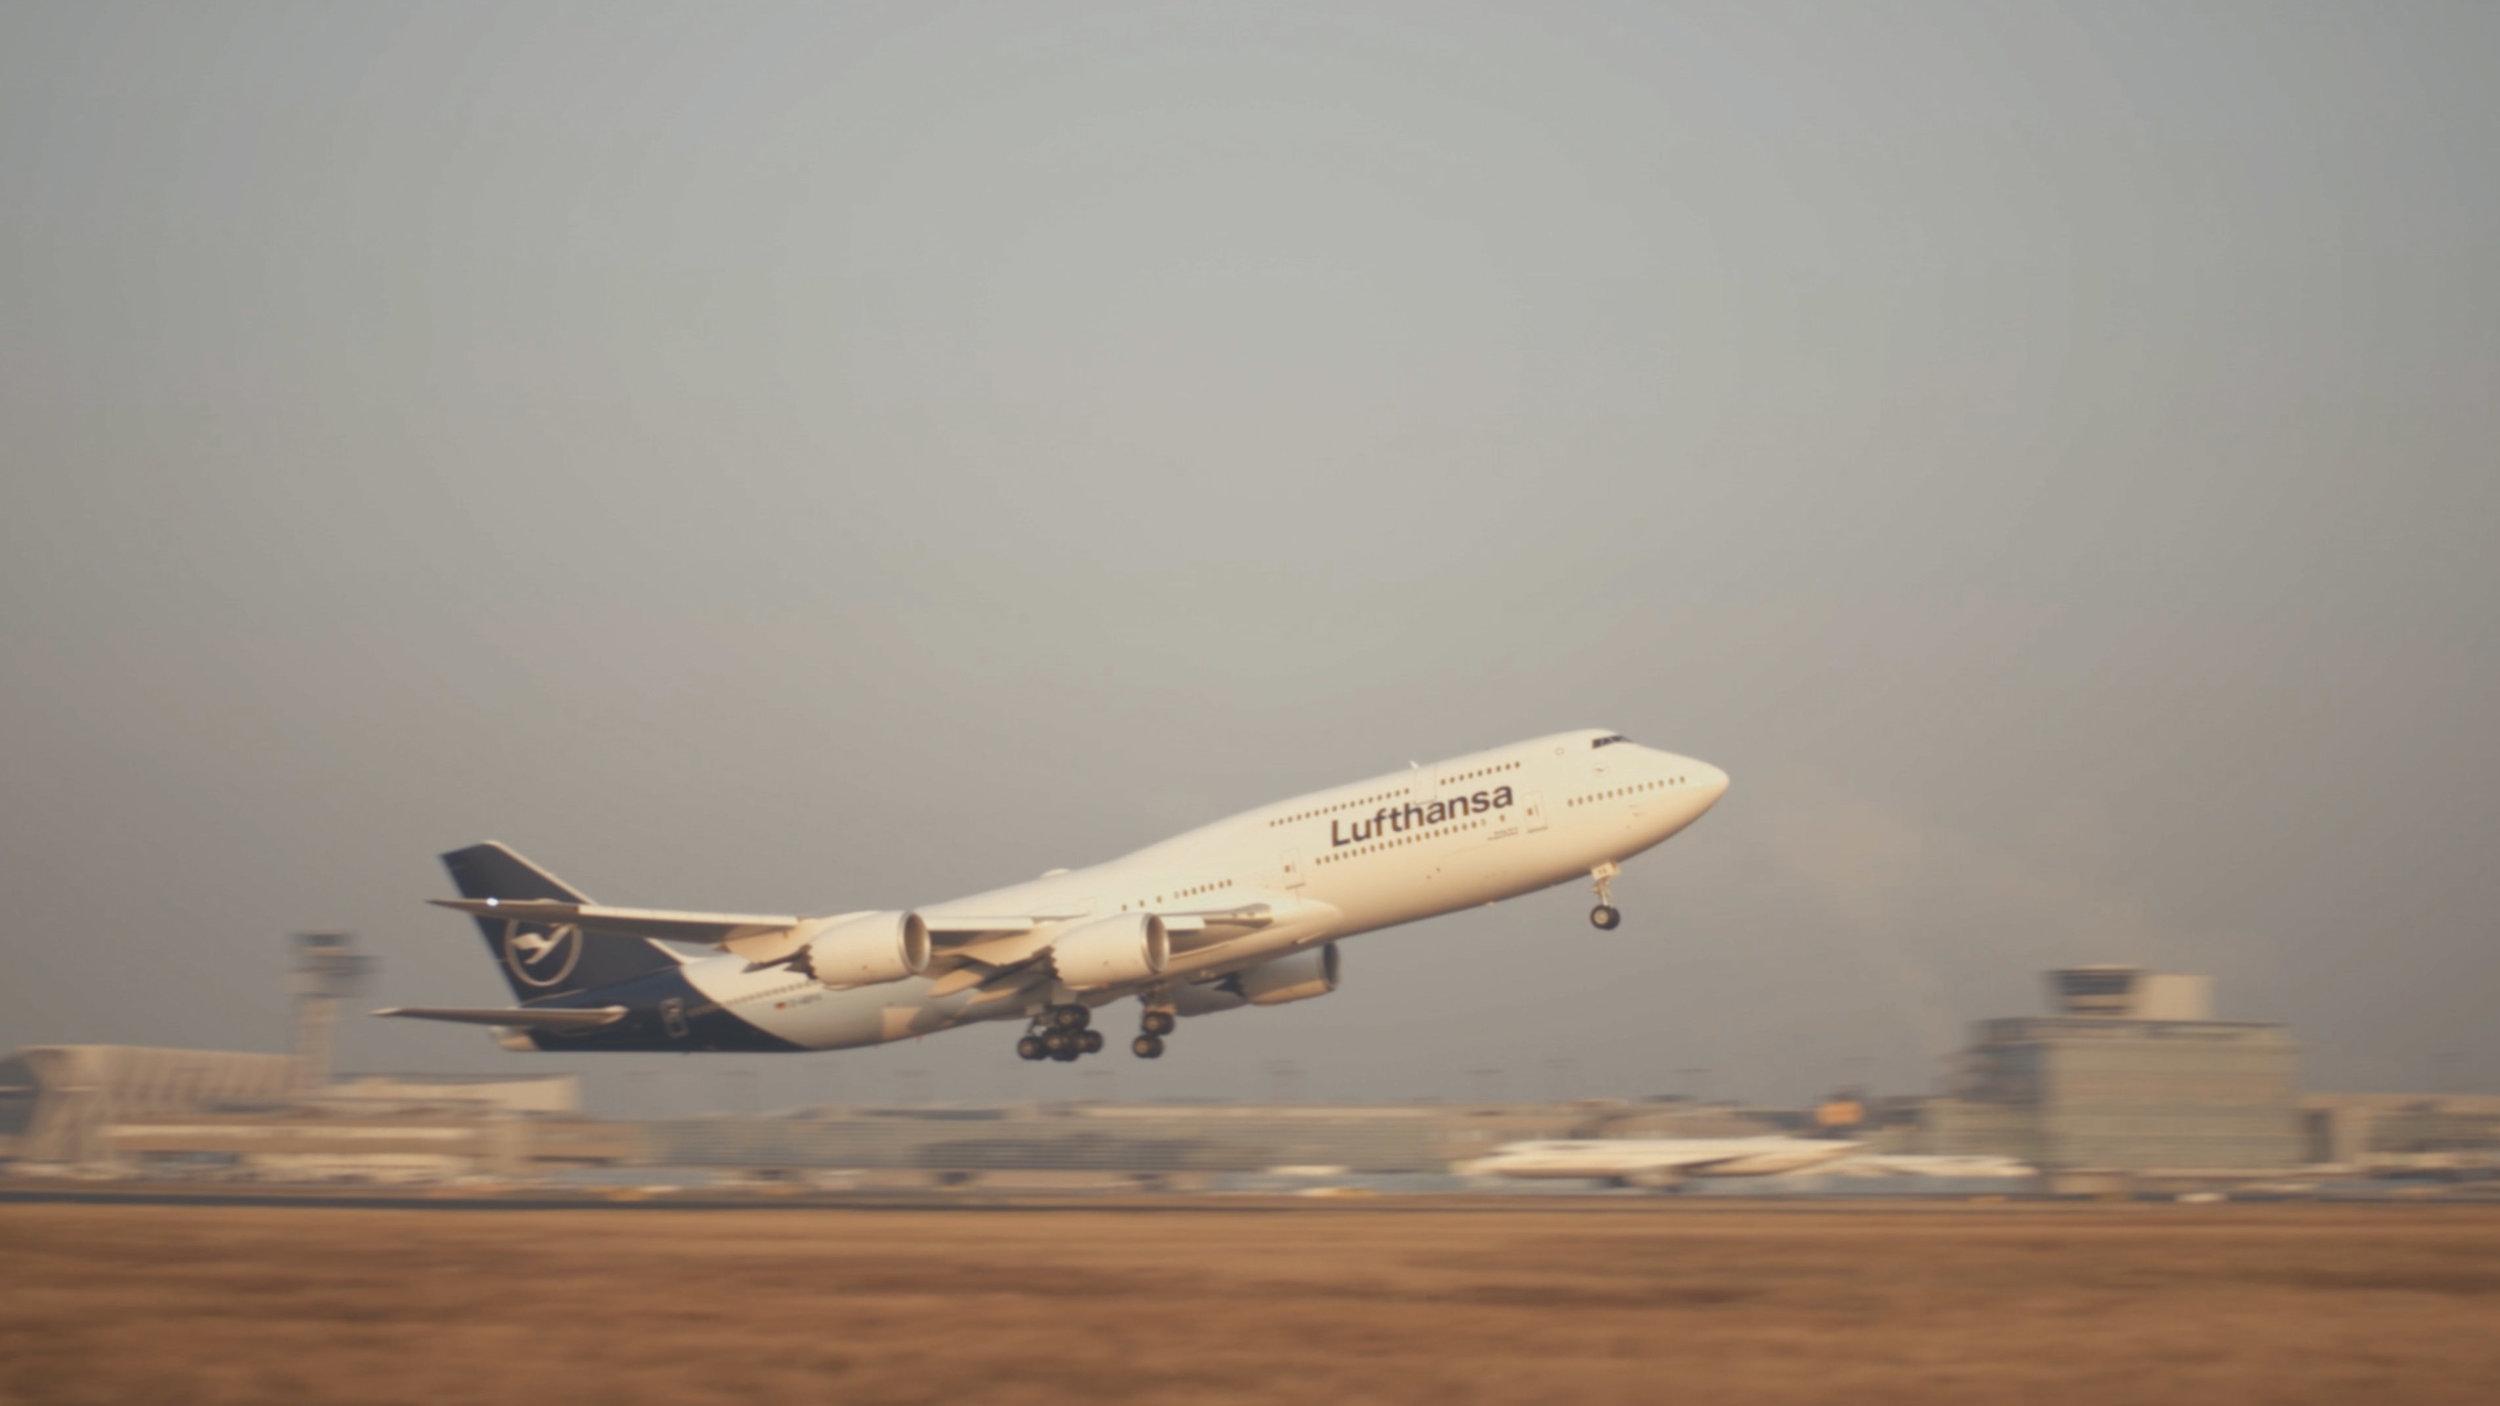 Lufthansa-Airplane-New-Airport-Surface-Beklebung-Travel-TakeOff_12.jpg